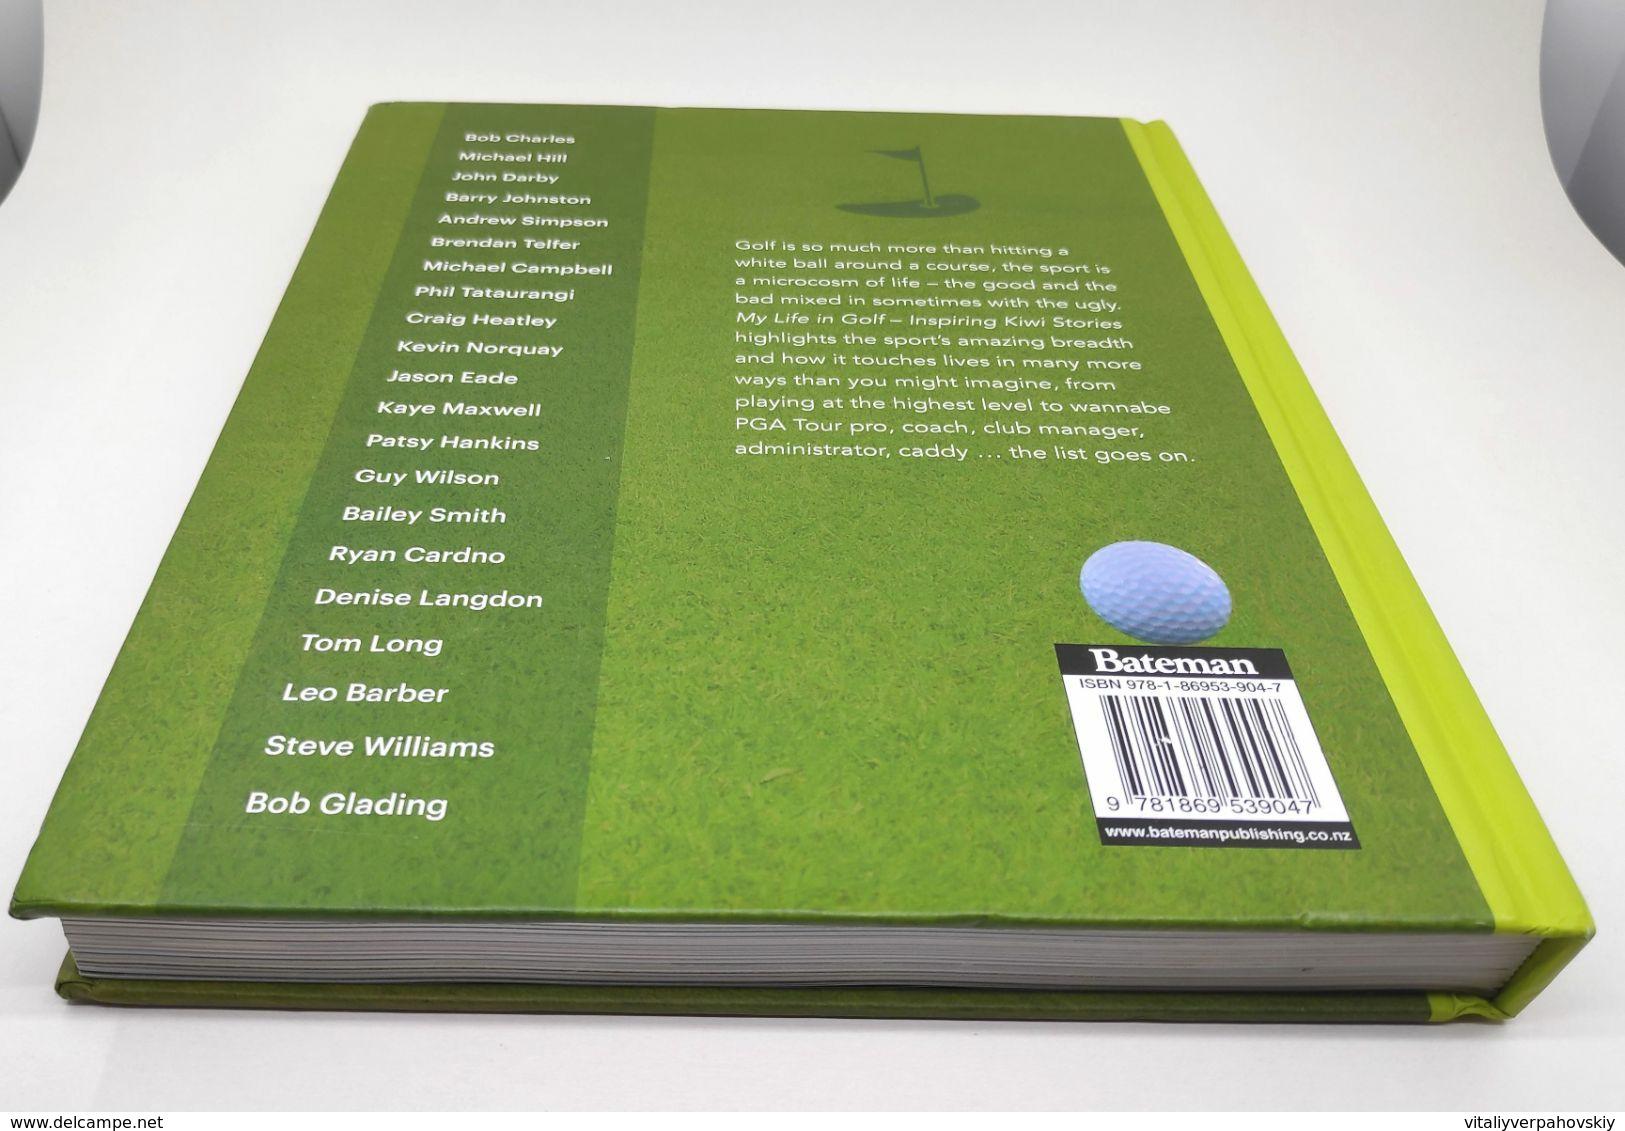 My Life In Golf - Inspiring Kiwi Stories. Heather Kidd. - Sports